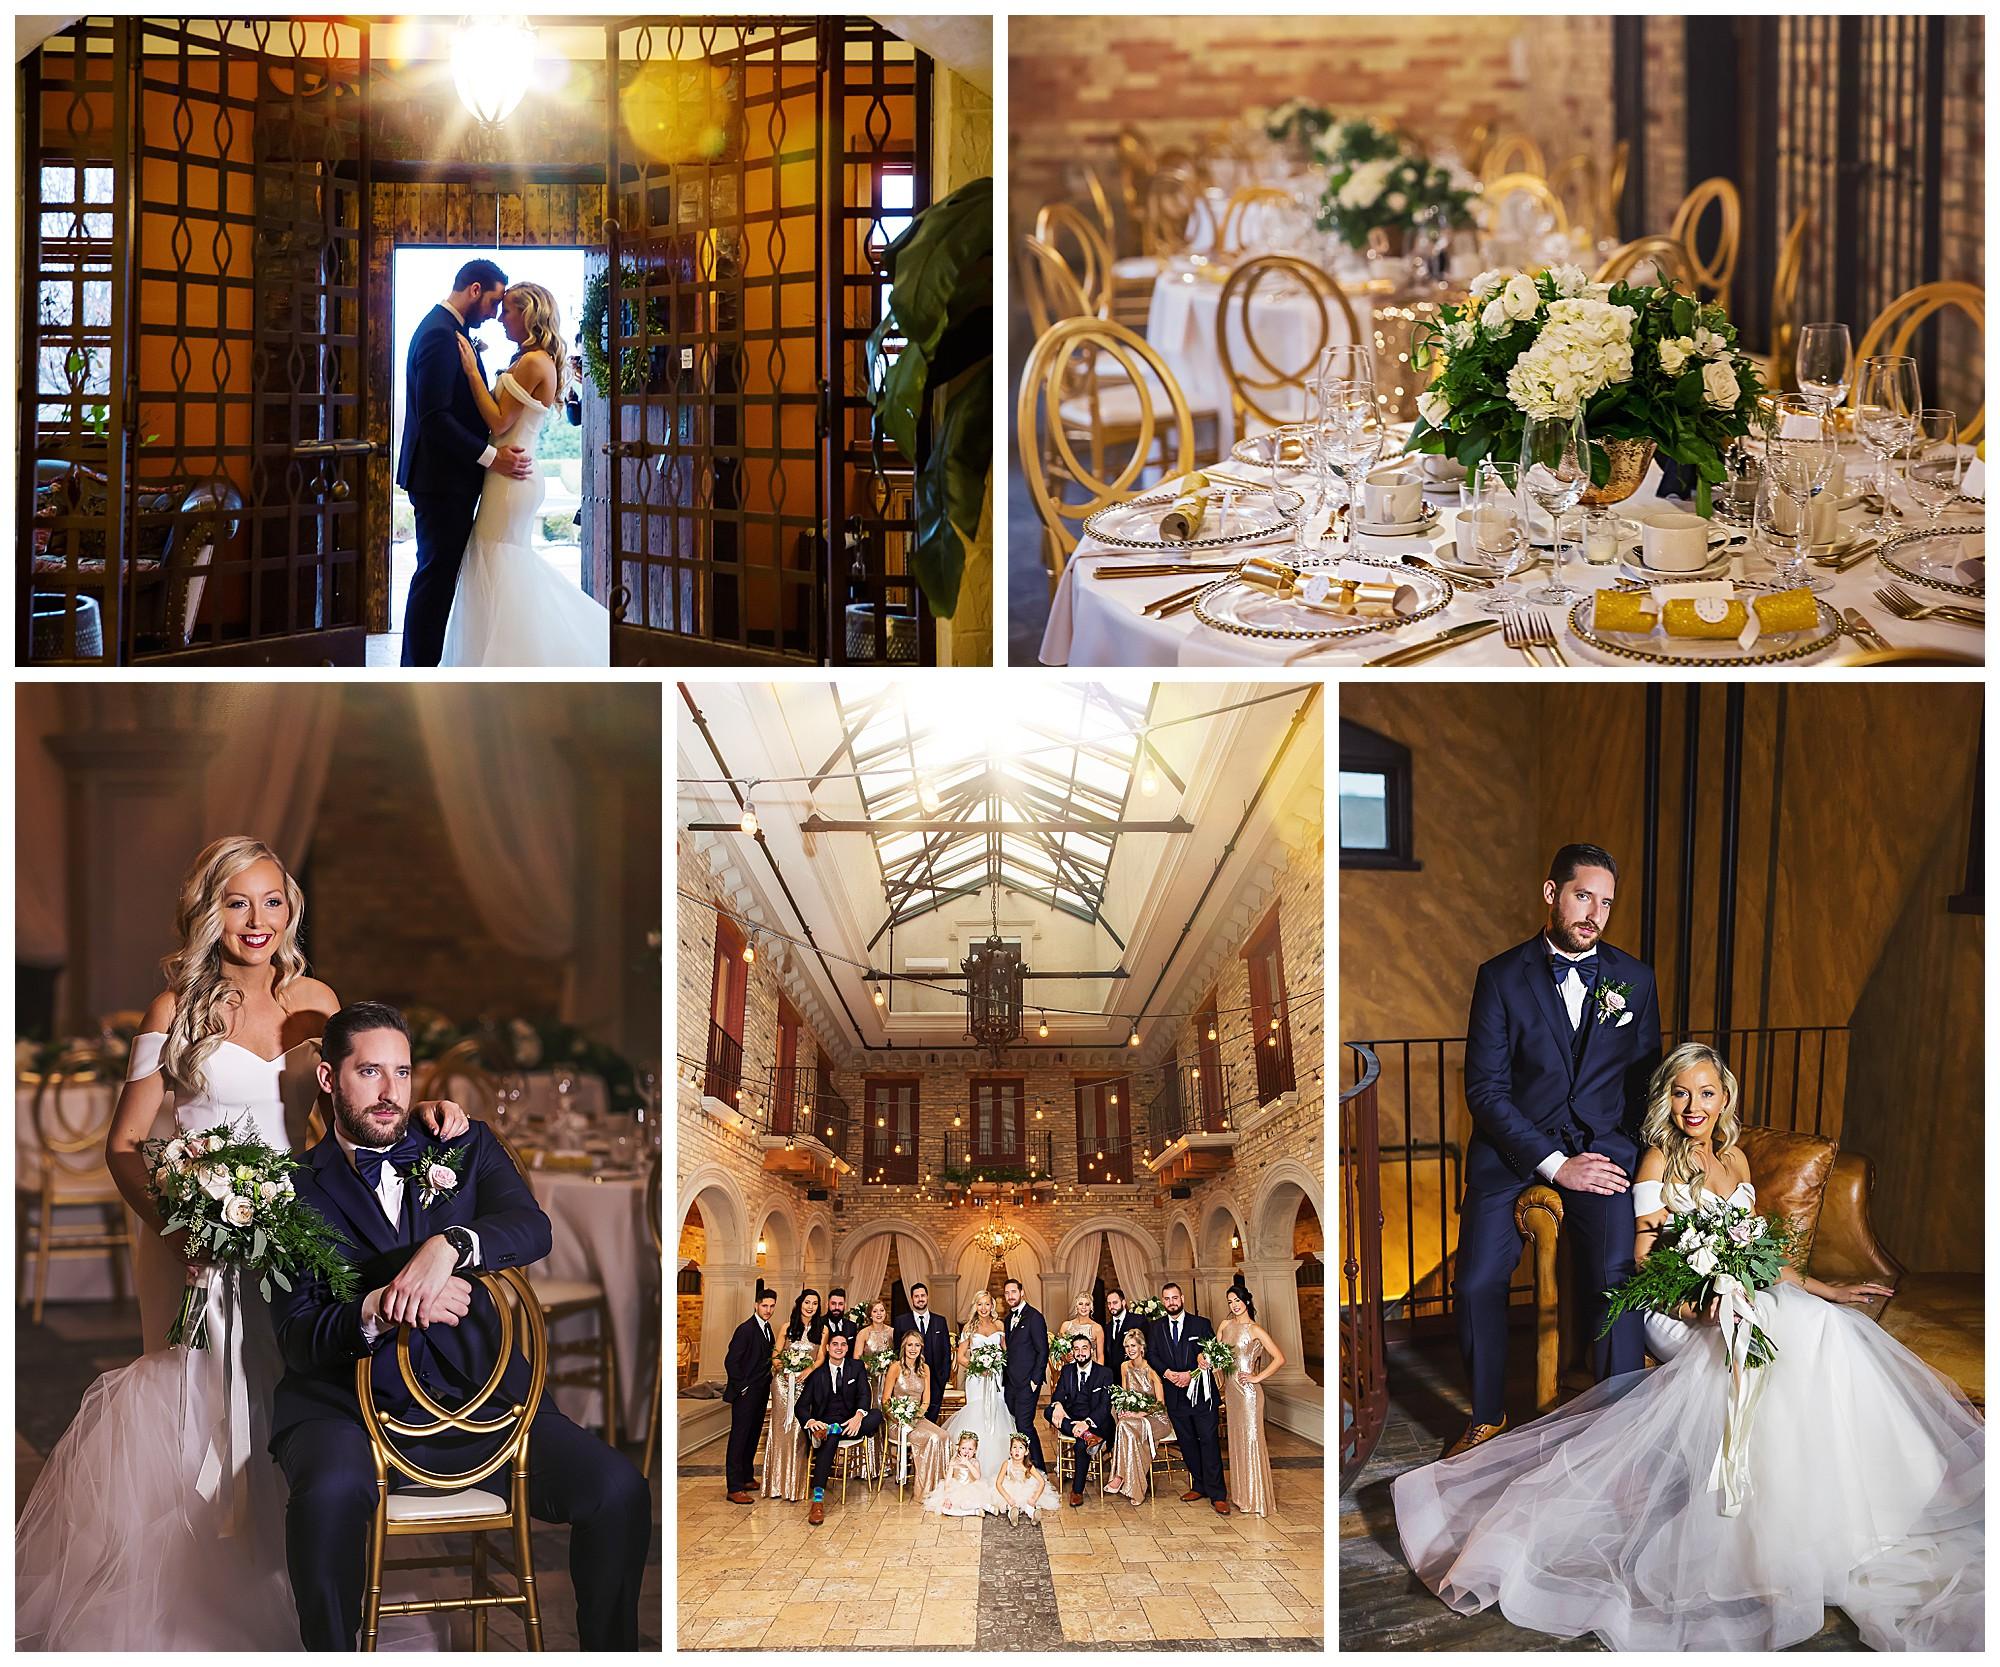 Hacienda-Sarria-Wedding-Photos-NYE-Michelle-Matt-VanDaele-Russell_0025.jpg